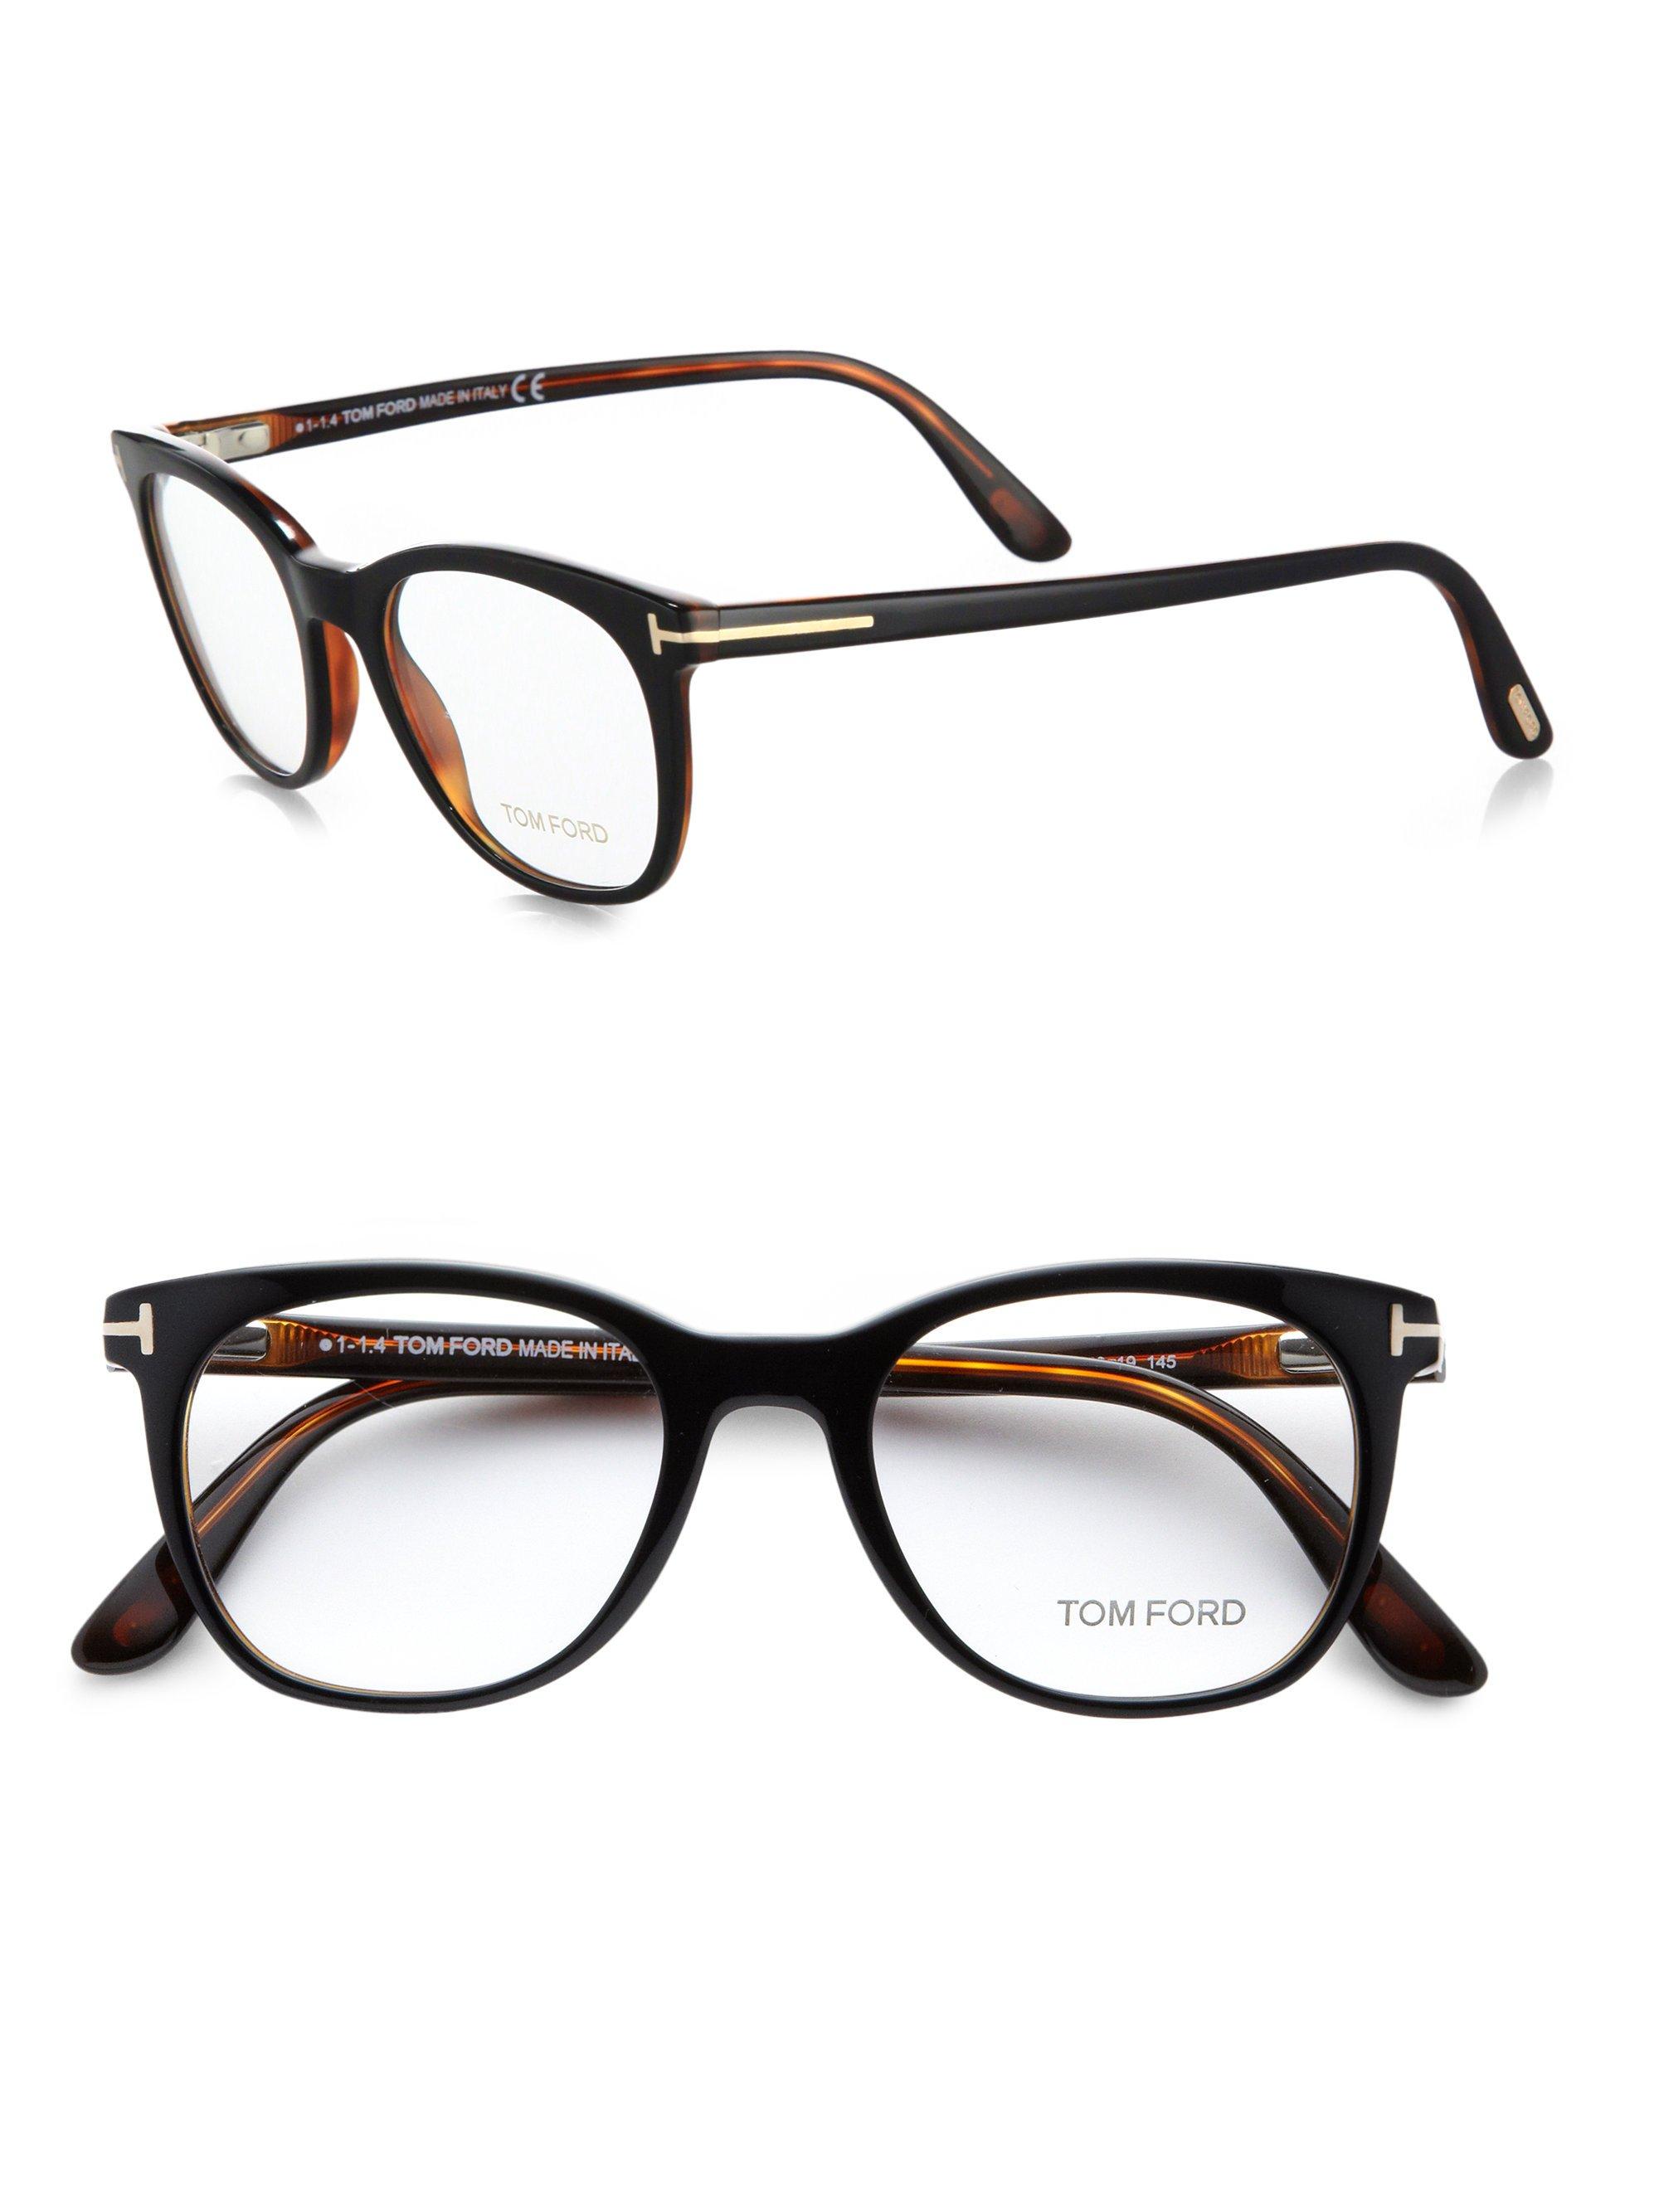 3471cff566 Tom Ford 5310 Rounded Optical Frames in Black for Men - Lyst